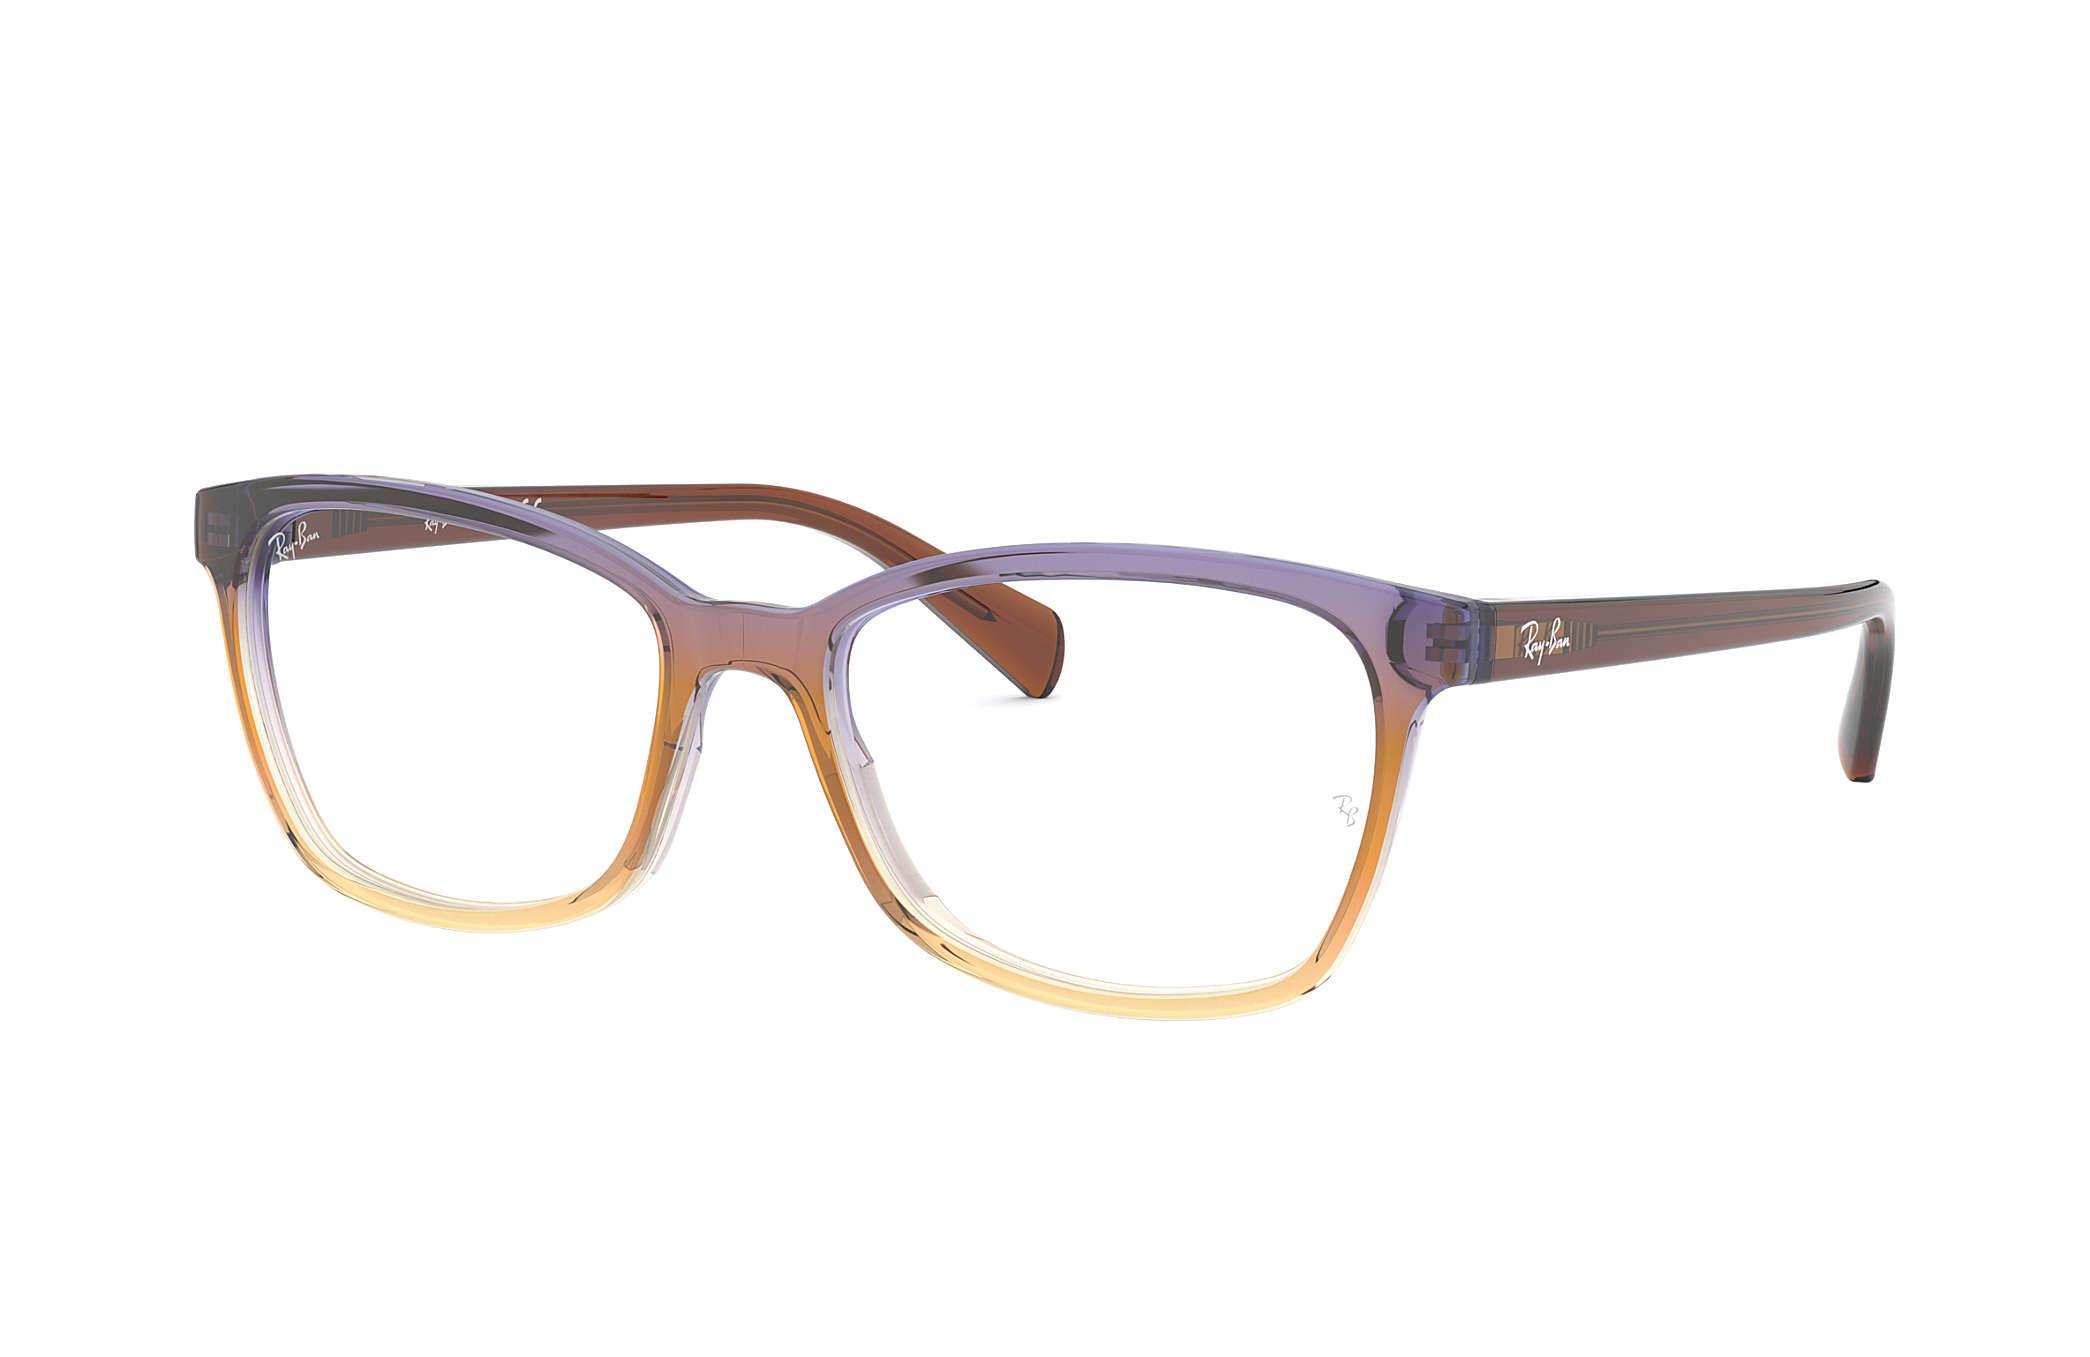 Glasögon Ray-Ban RB5362 Trigradient Brown Violet Yellow - Acetat ... 9b3ff447c68c9